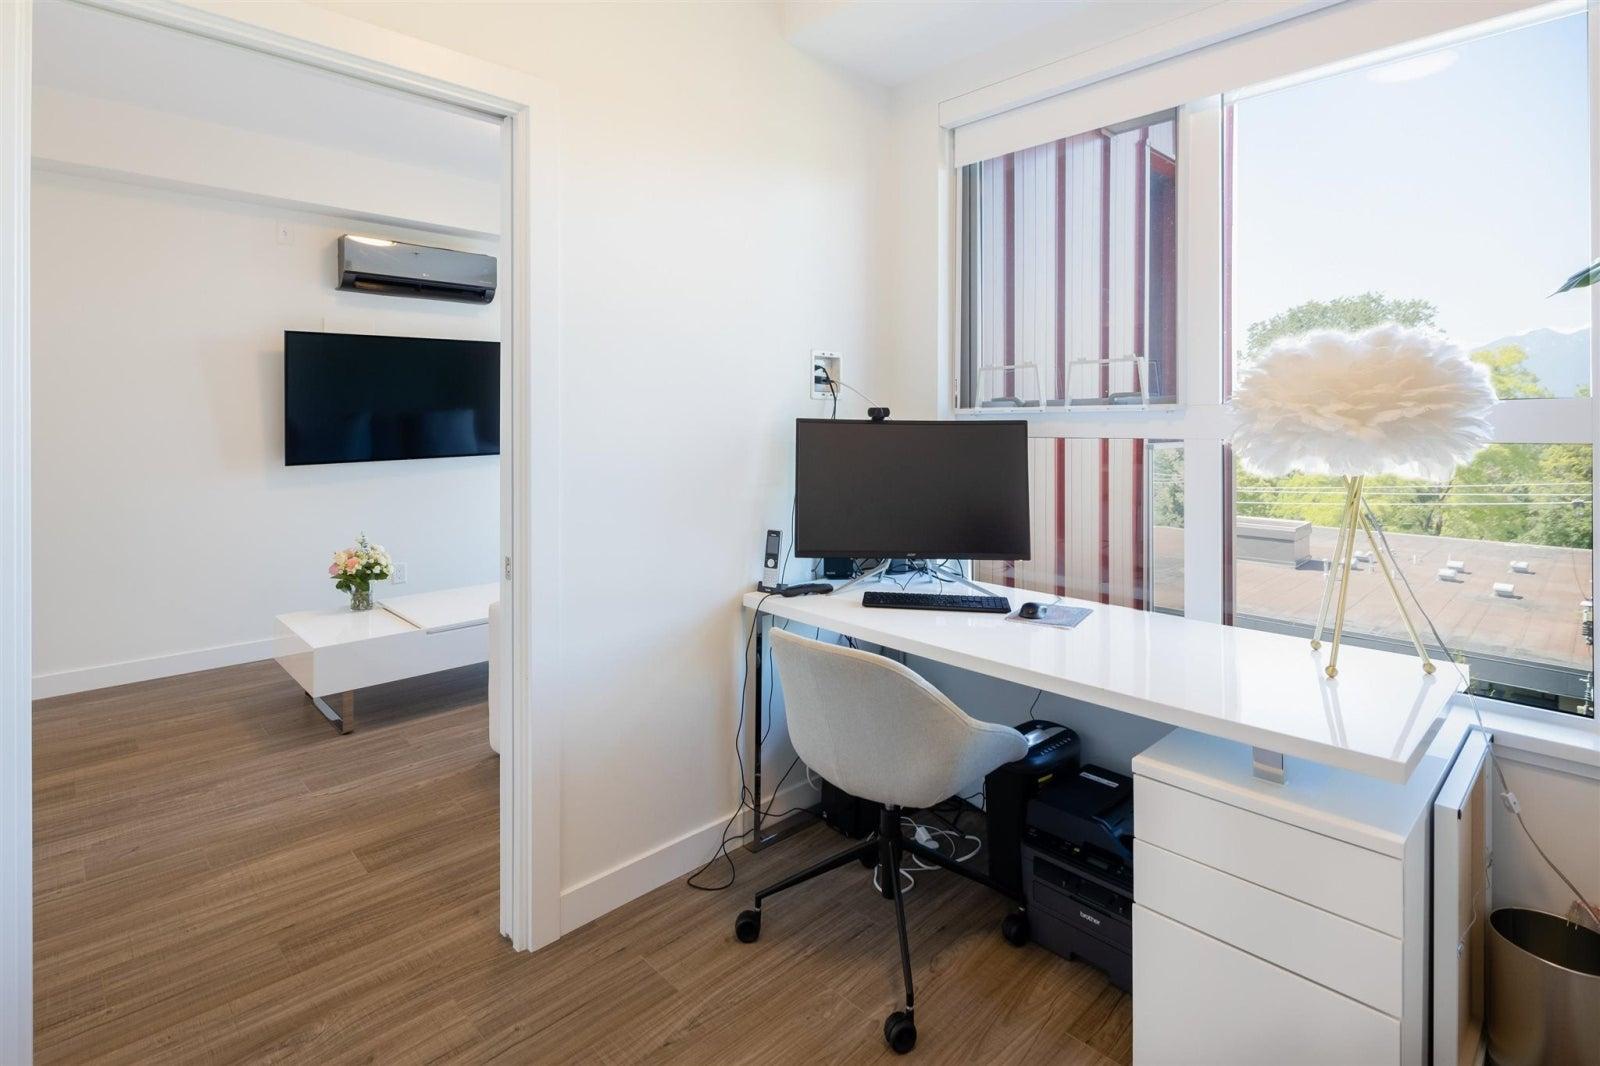 408 379 E BROADWAY AVENUE - Mount Pleasant VE Apartment/Condo for sale, 2 Bedrooms (R2599900) #18